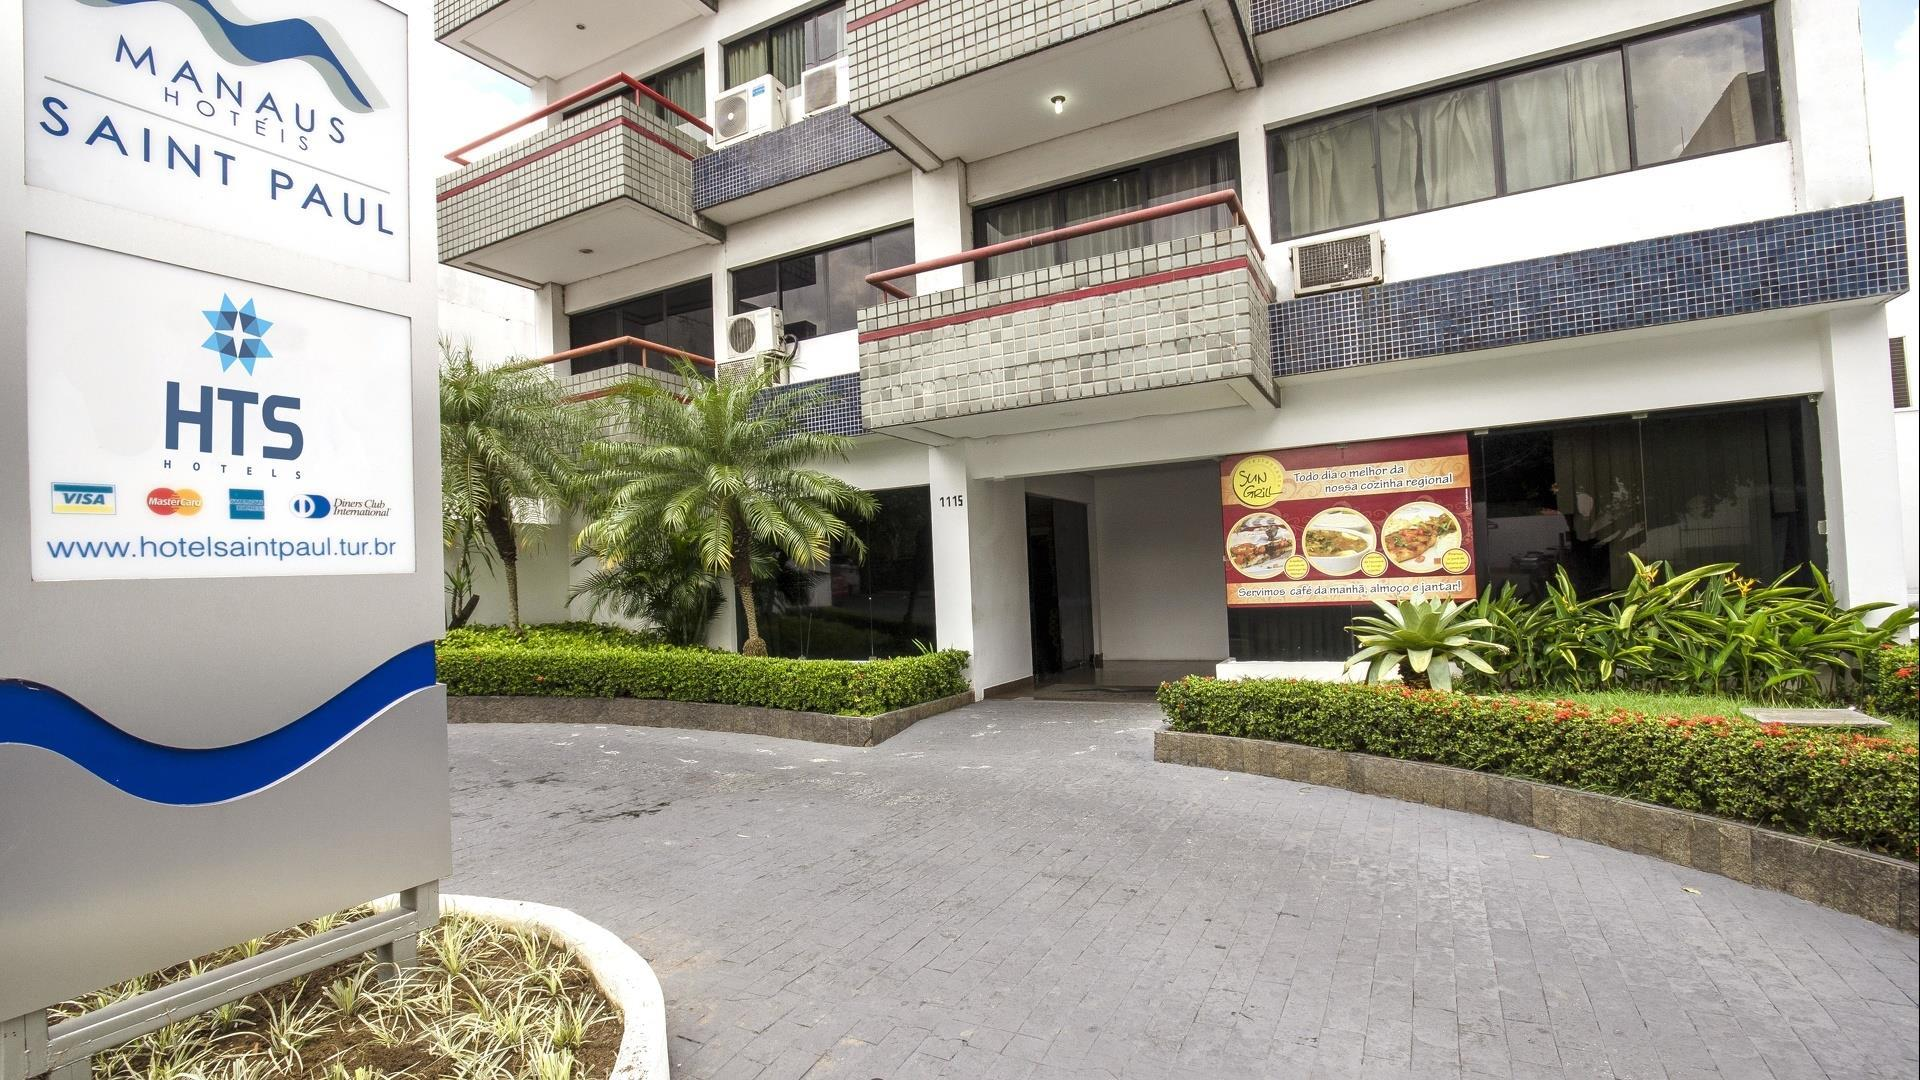 Brasilien manaus hotel saint paul standard hotel for Hotels saintes